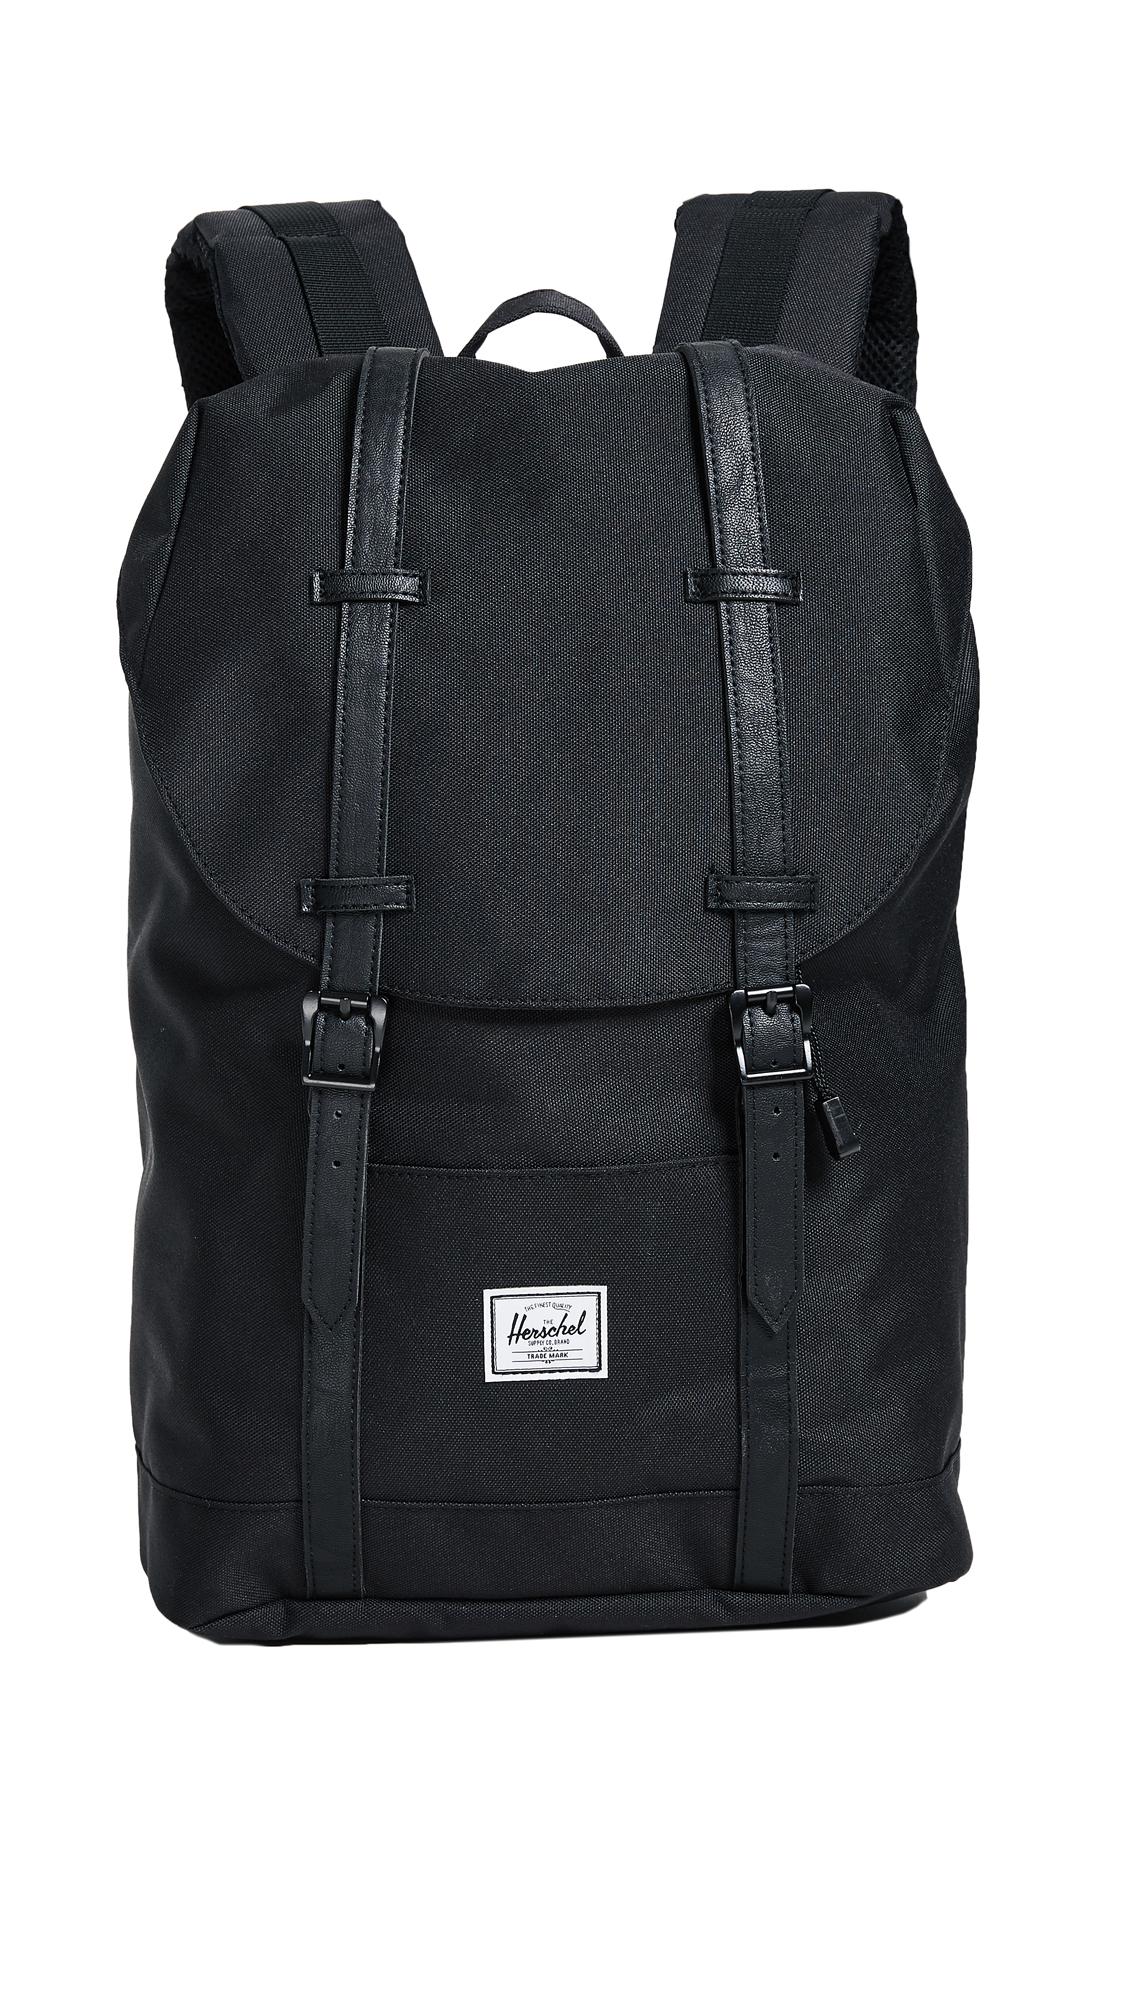 Herschel Supply Co. Retreat Mid Volume Backpack - Black/Black